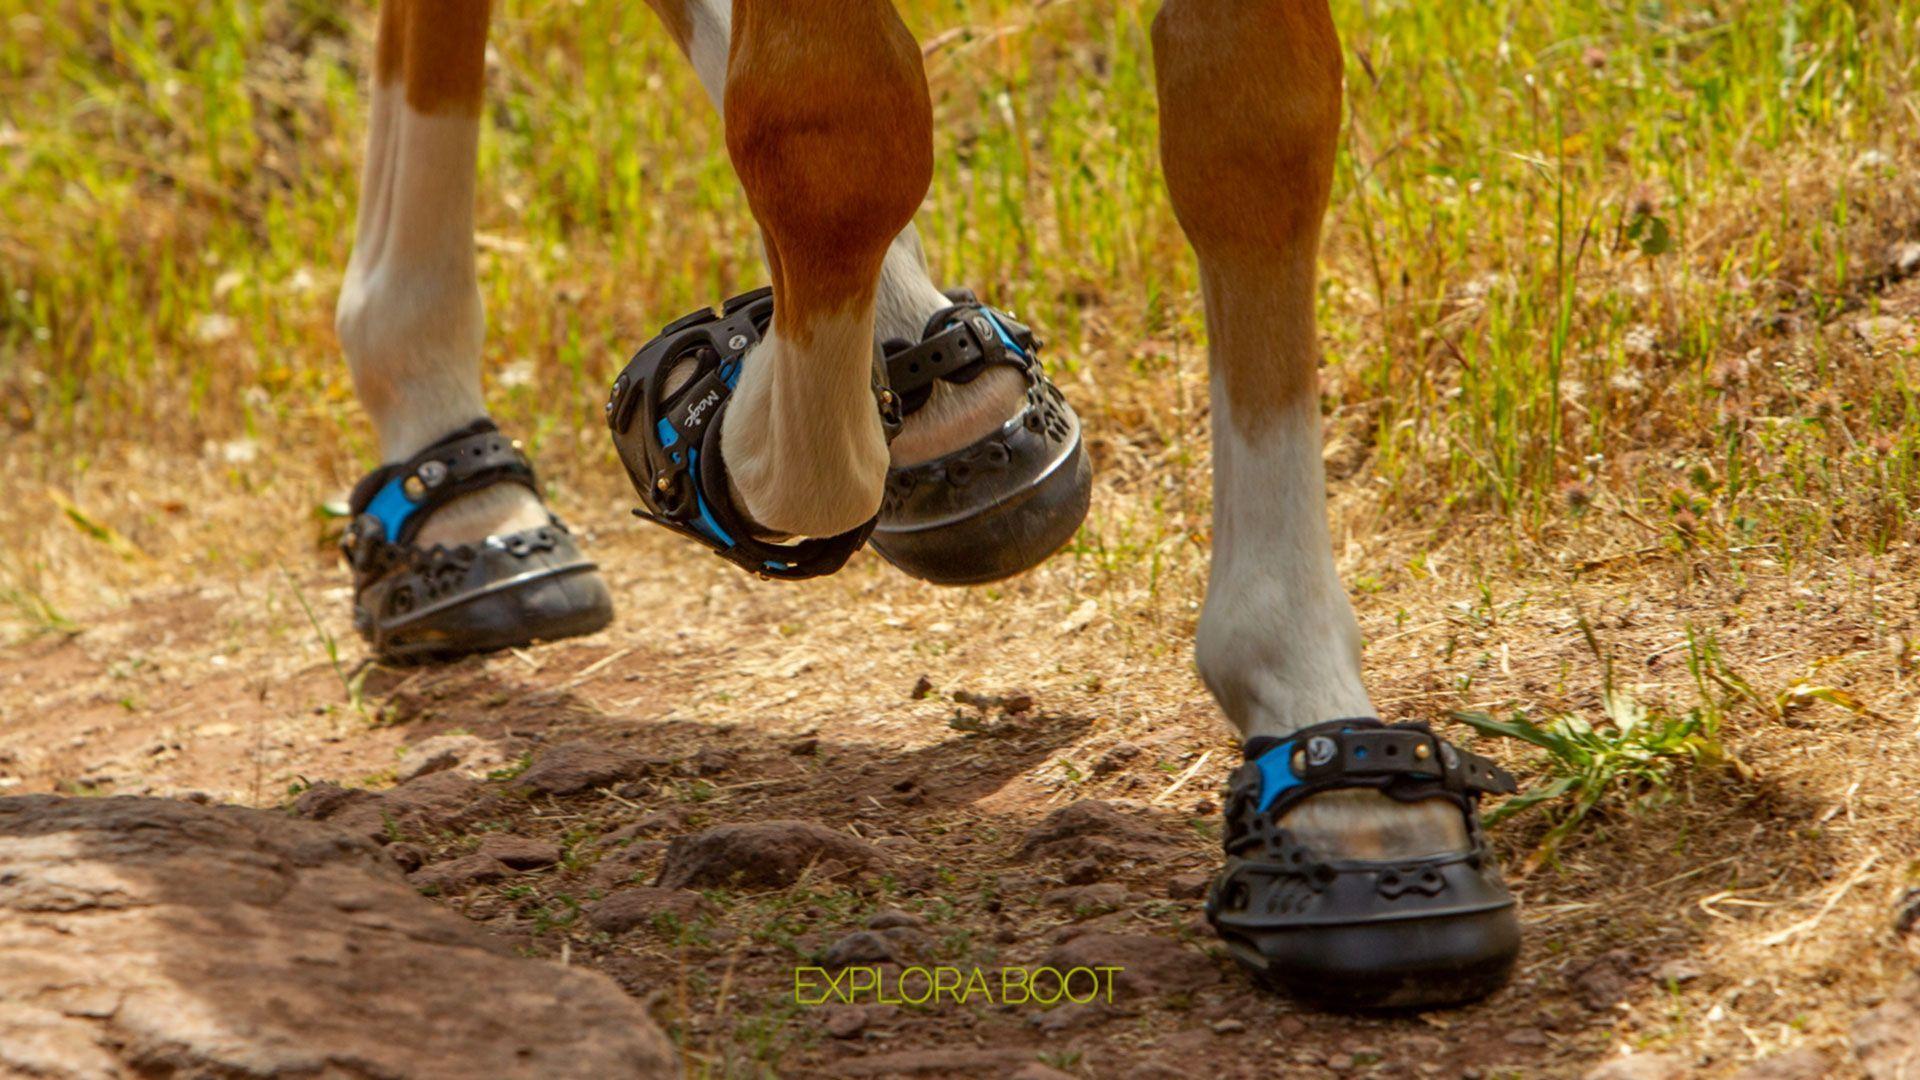 Explora Boot, the spanish hoof boots